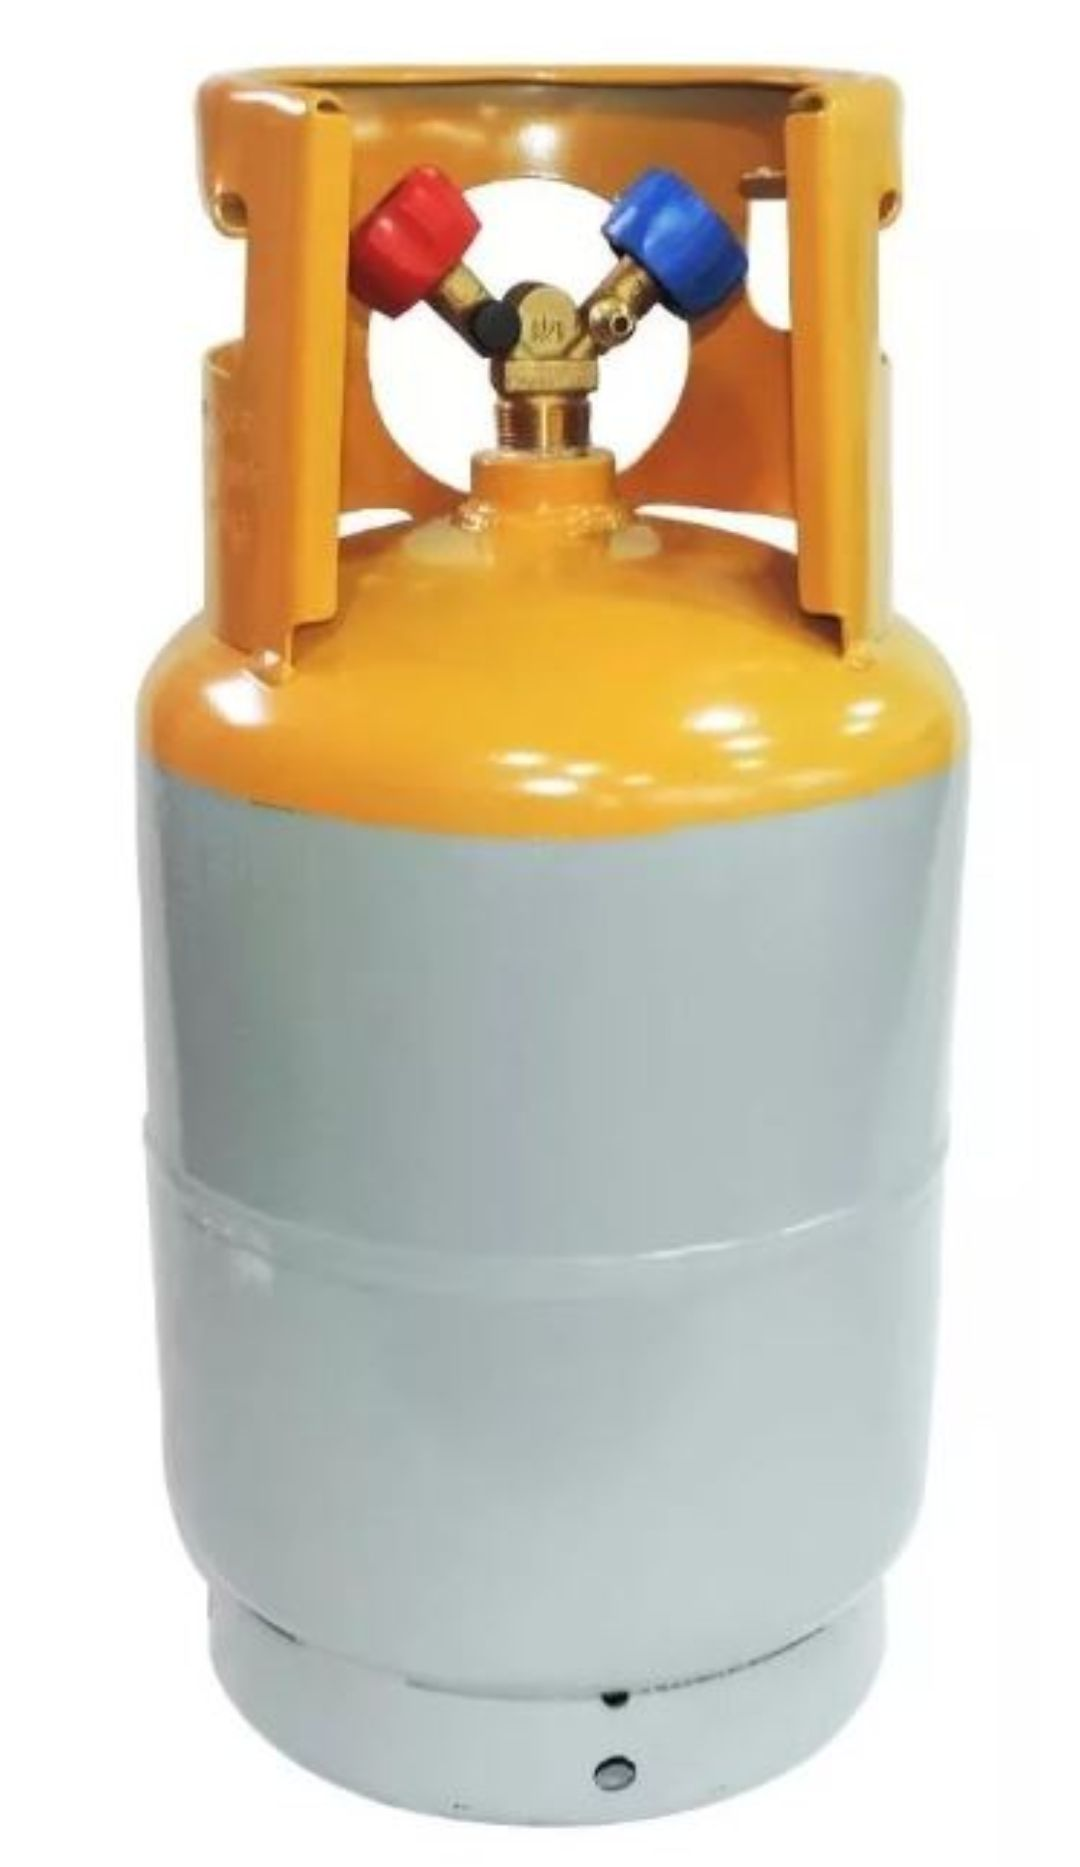 Tanque Recolhedor Refrigerante 13,6 Kg 10lbs